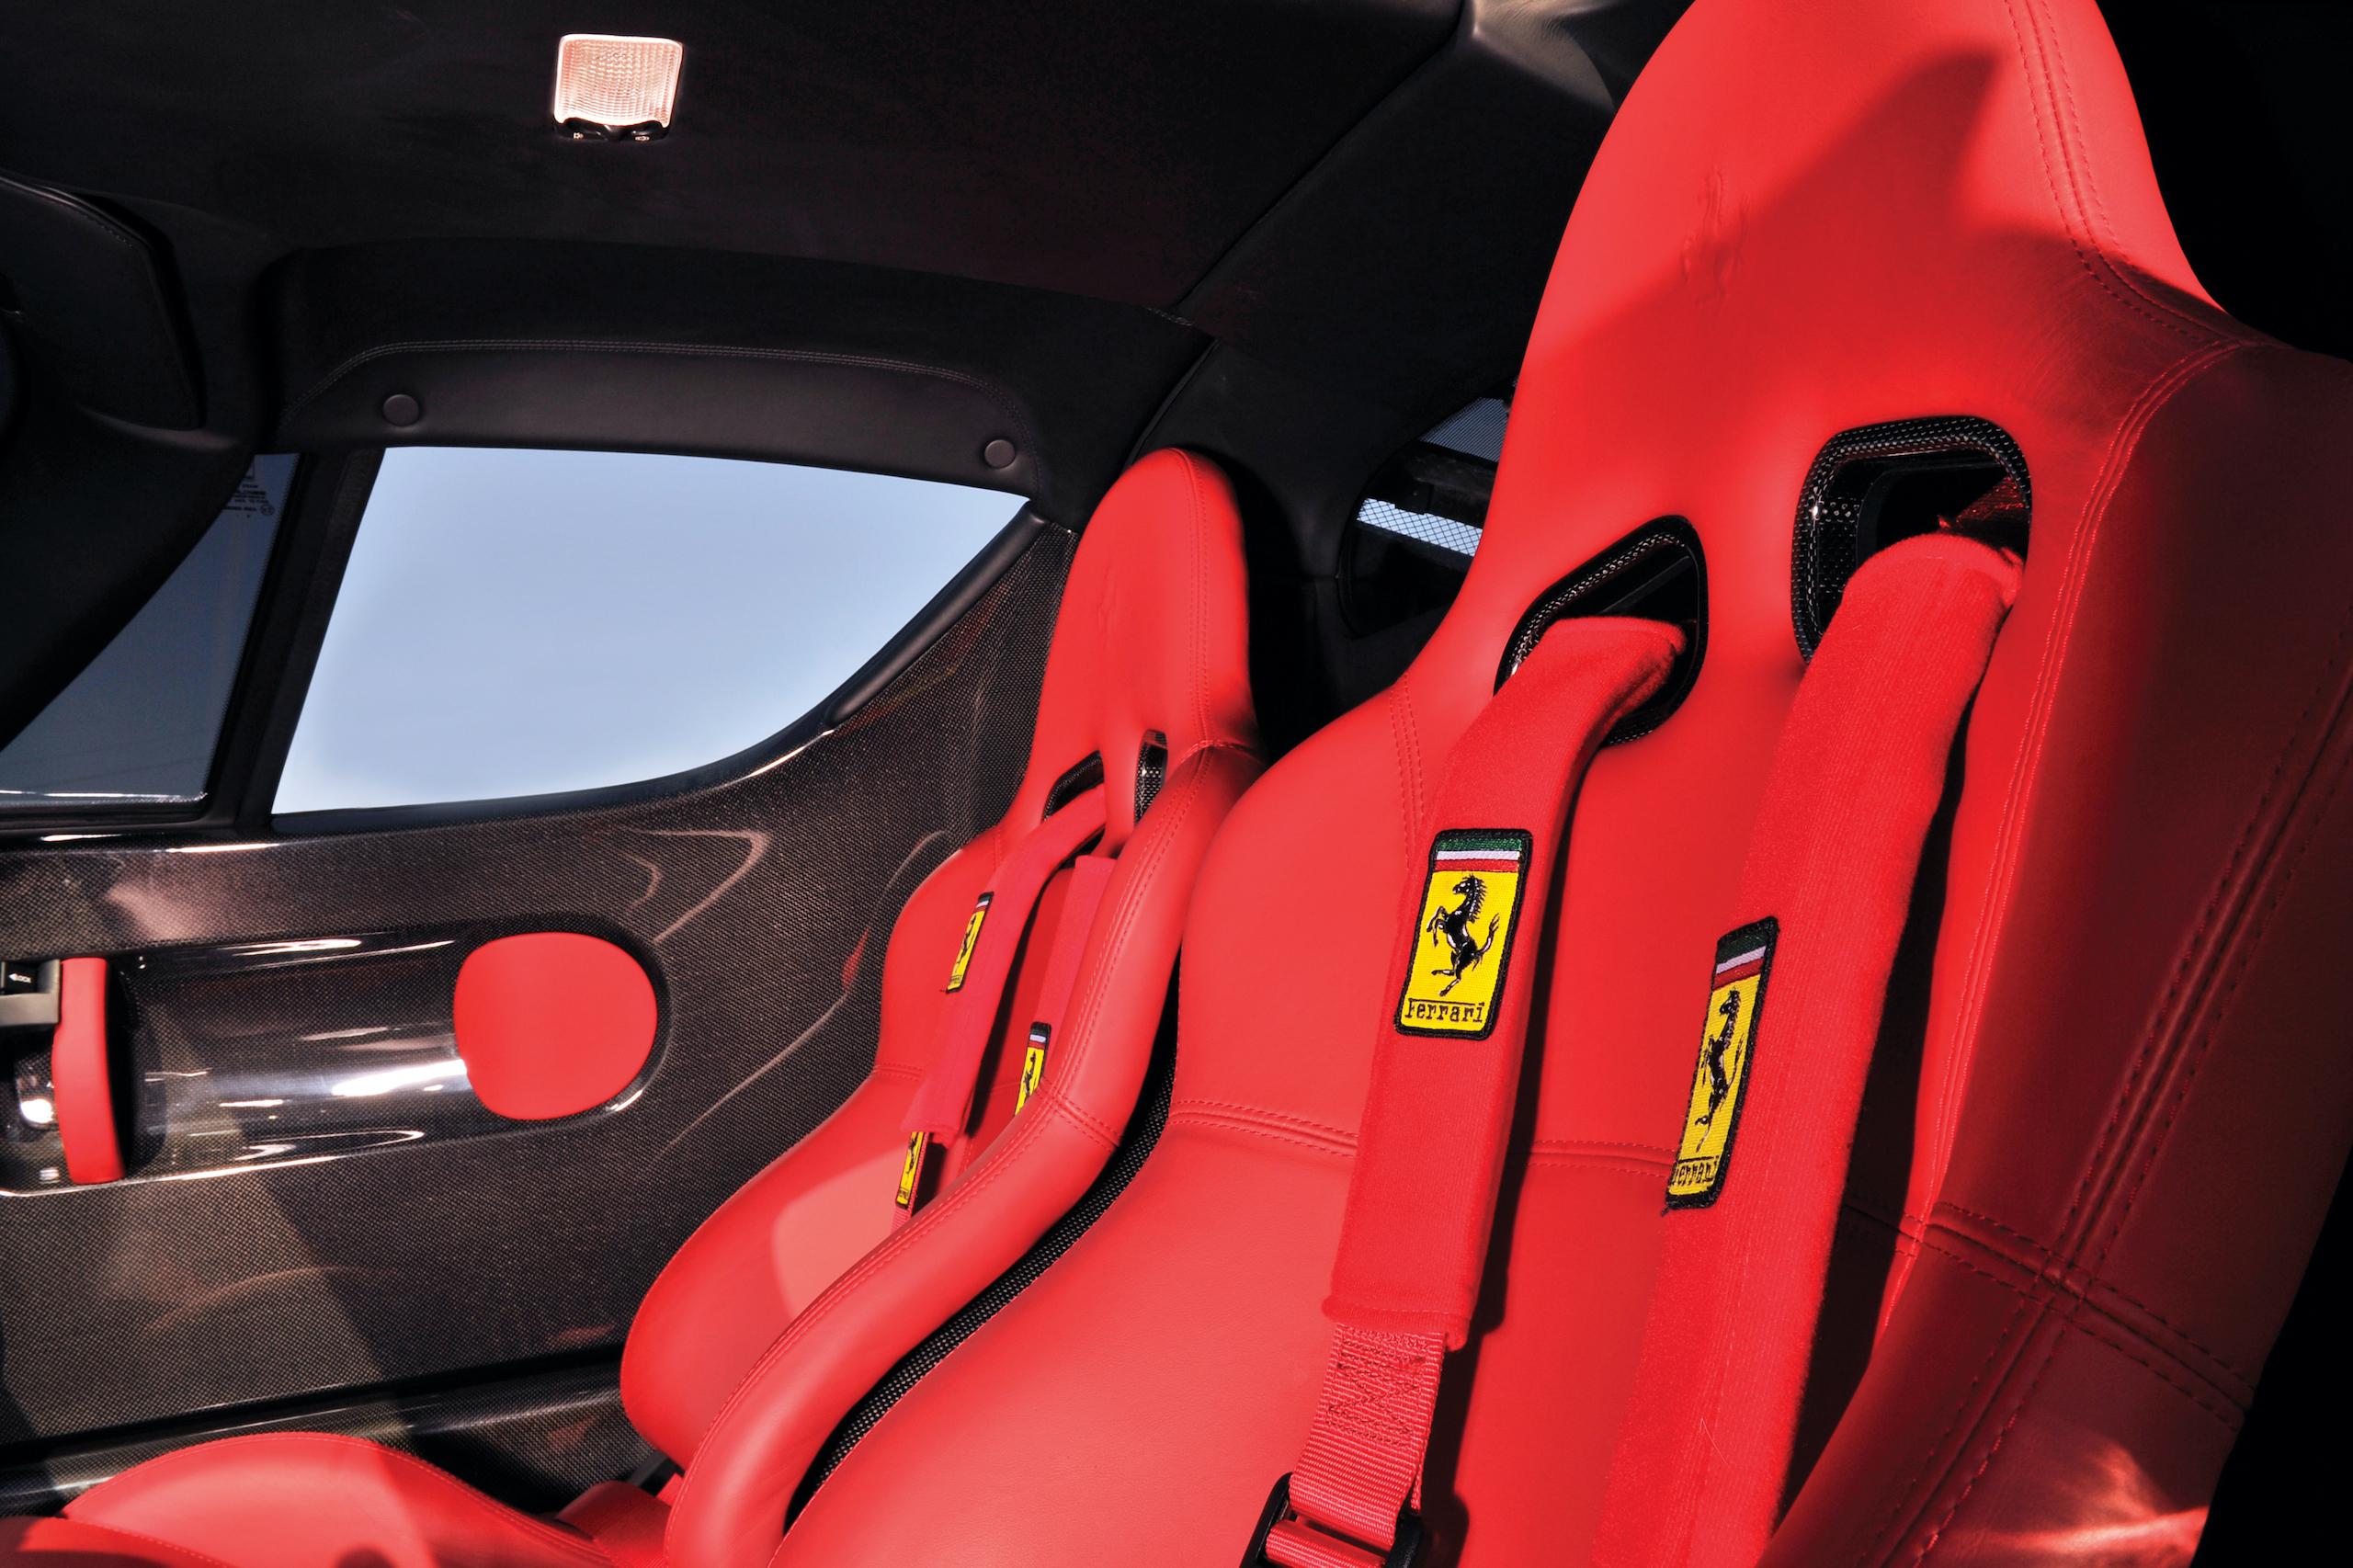 2004 Ferrari Enzo interior seats